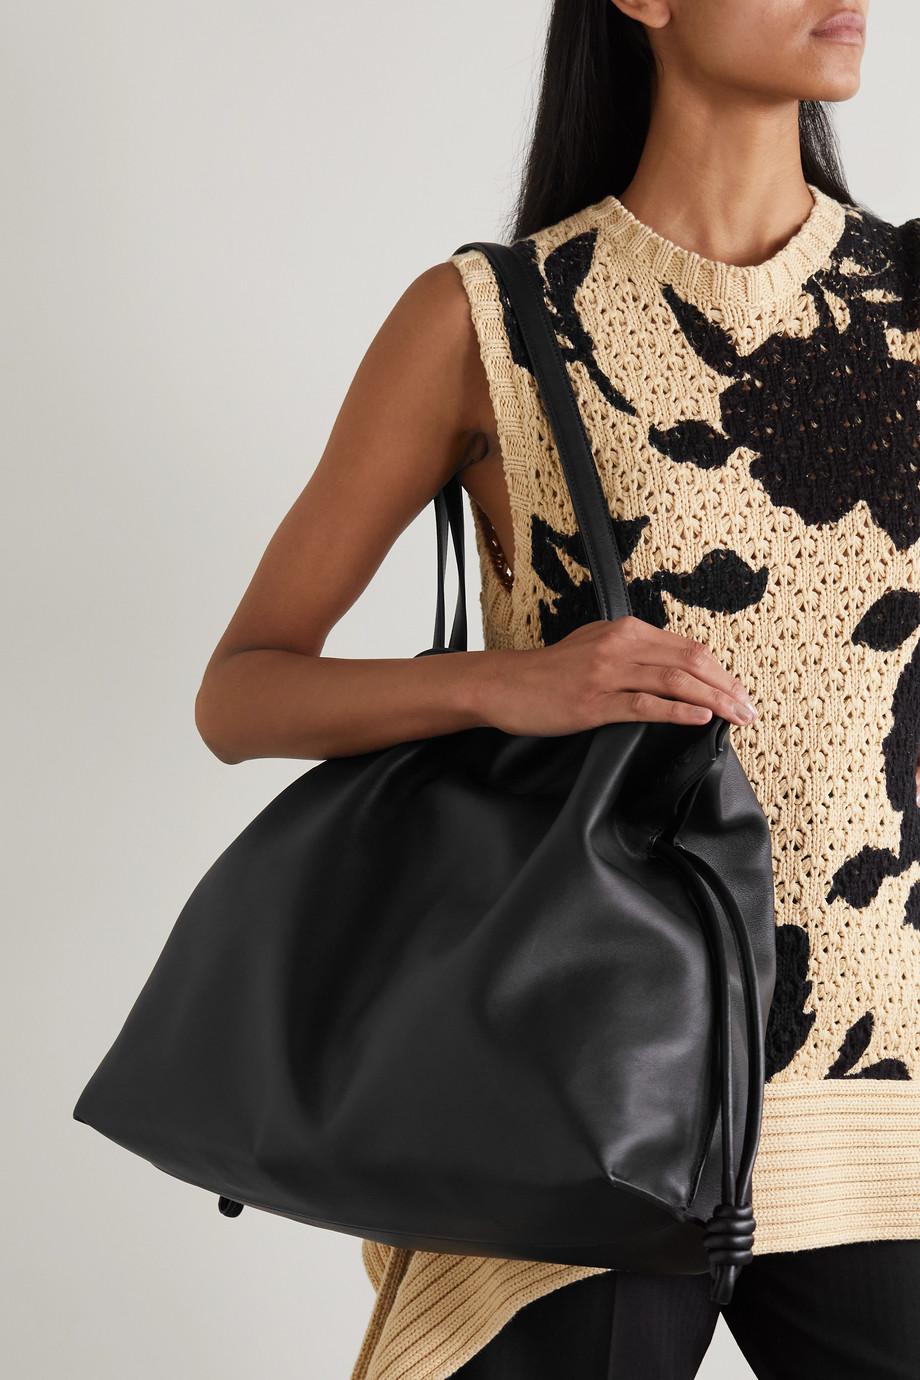 Loewe Flamenco XL leather tote